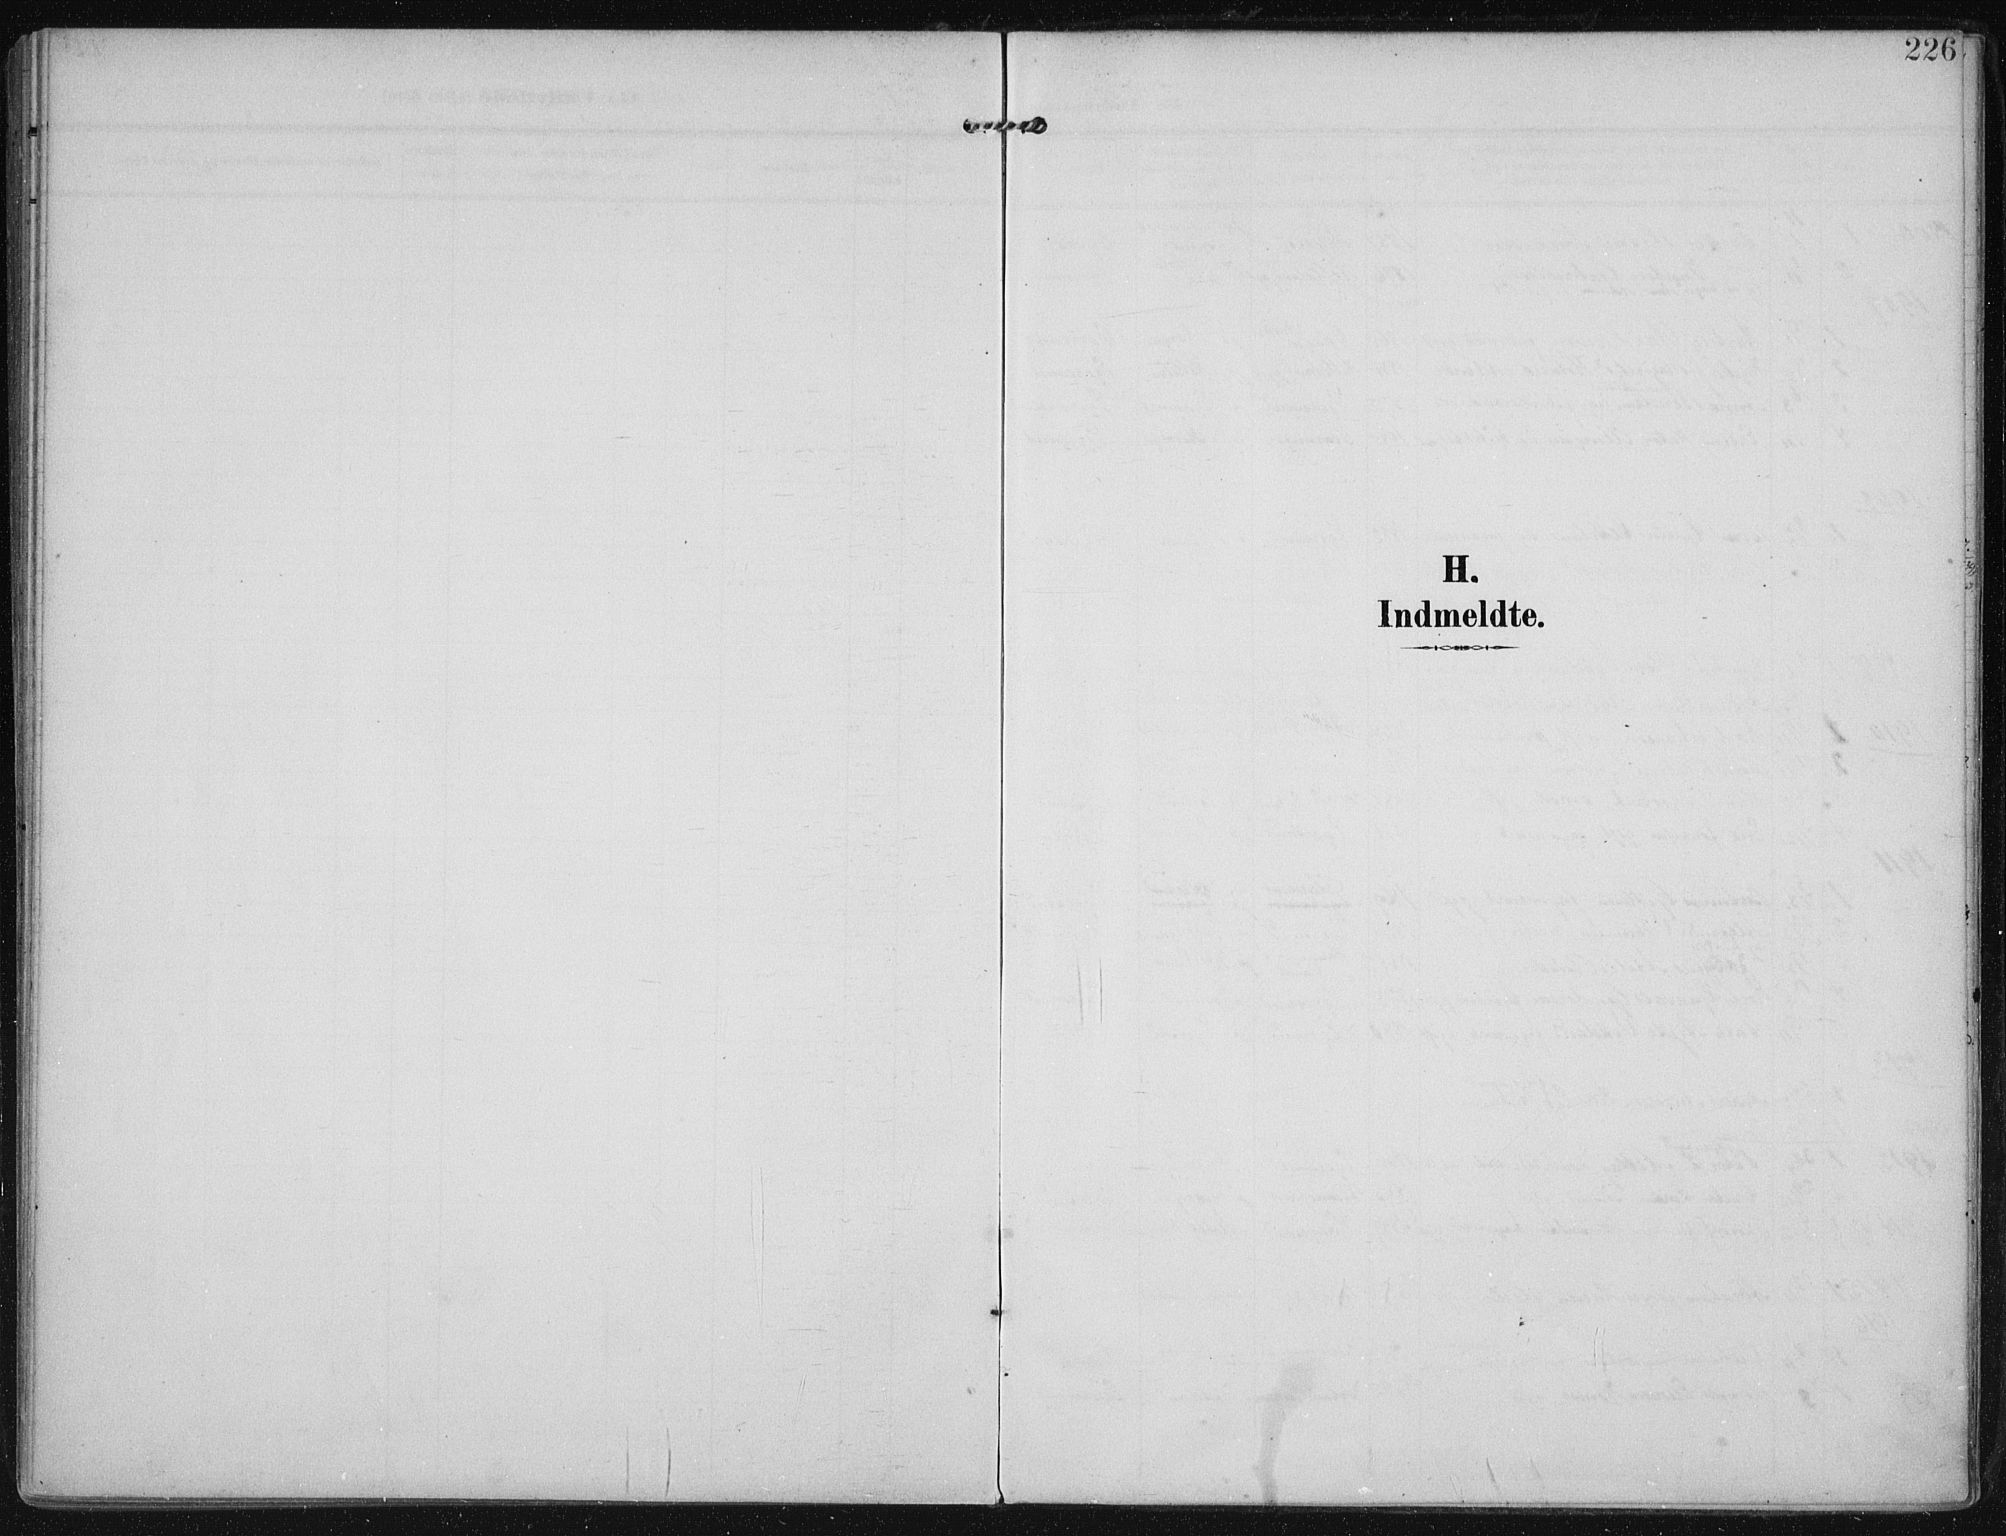 SAST, Egersund sokneprestkontor, Ministerialbok nr. A 21, 1905-1928, s. 226